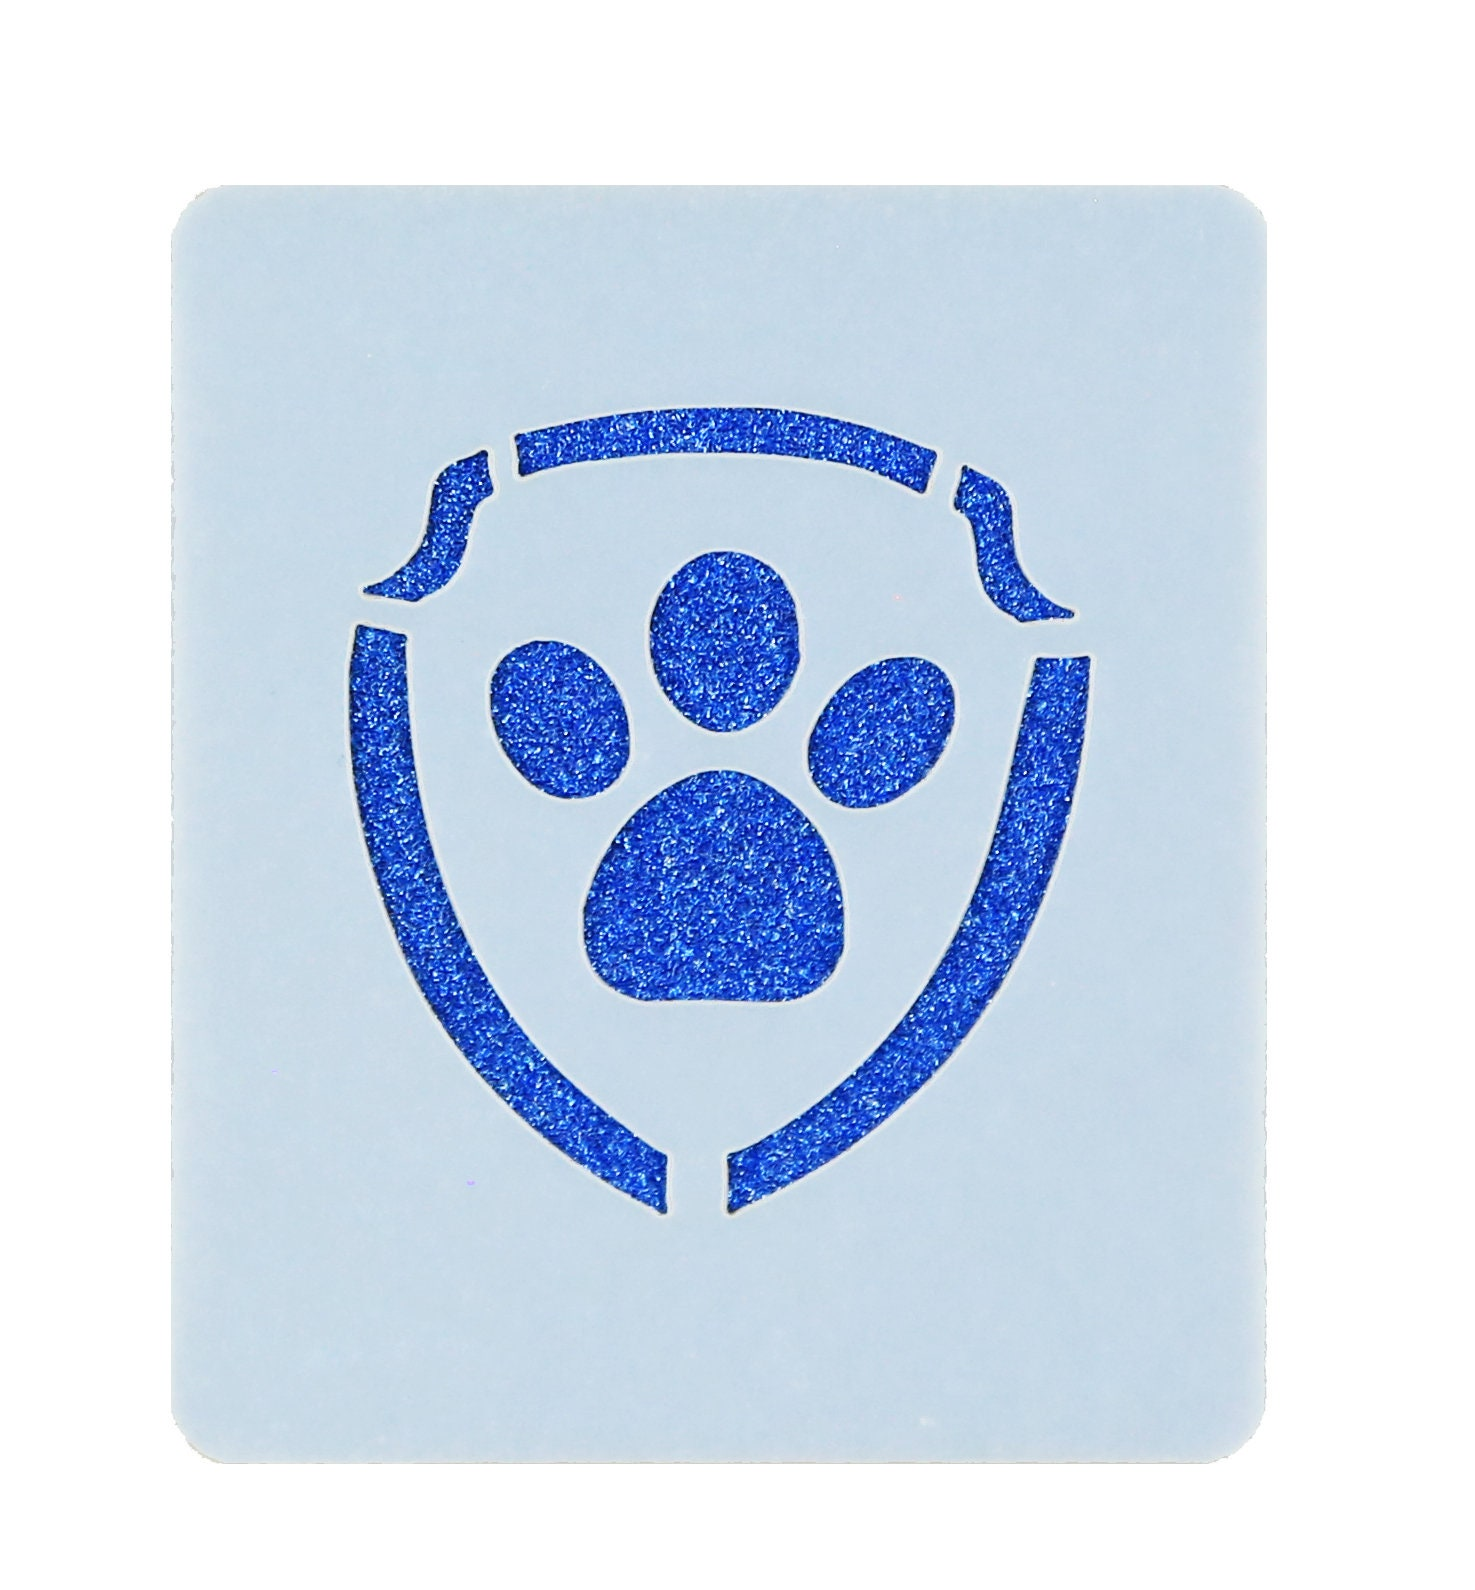 paw patrol logo face painting stencil 7cm x 6cm washable